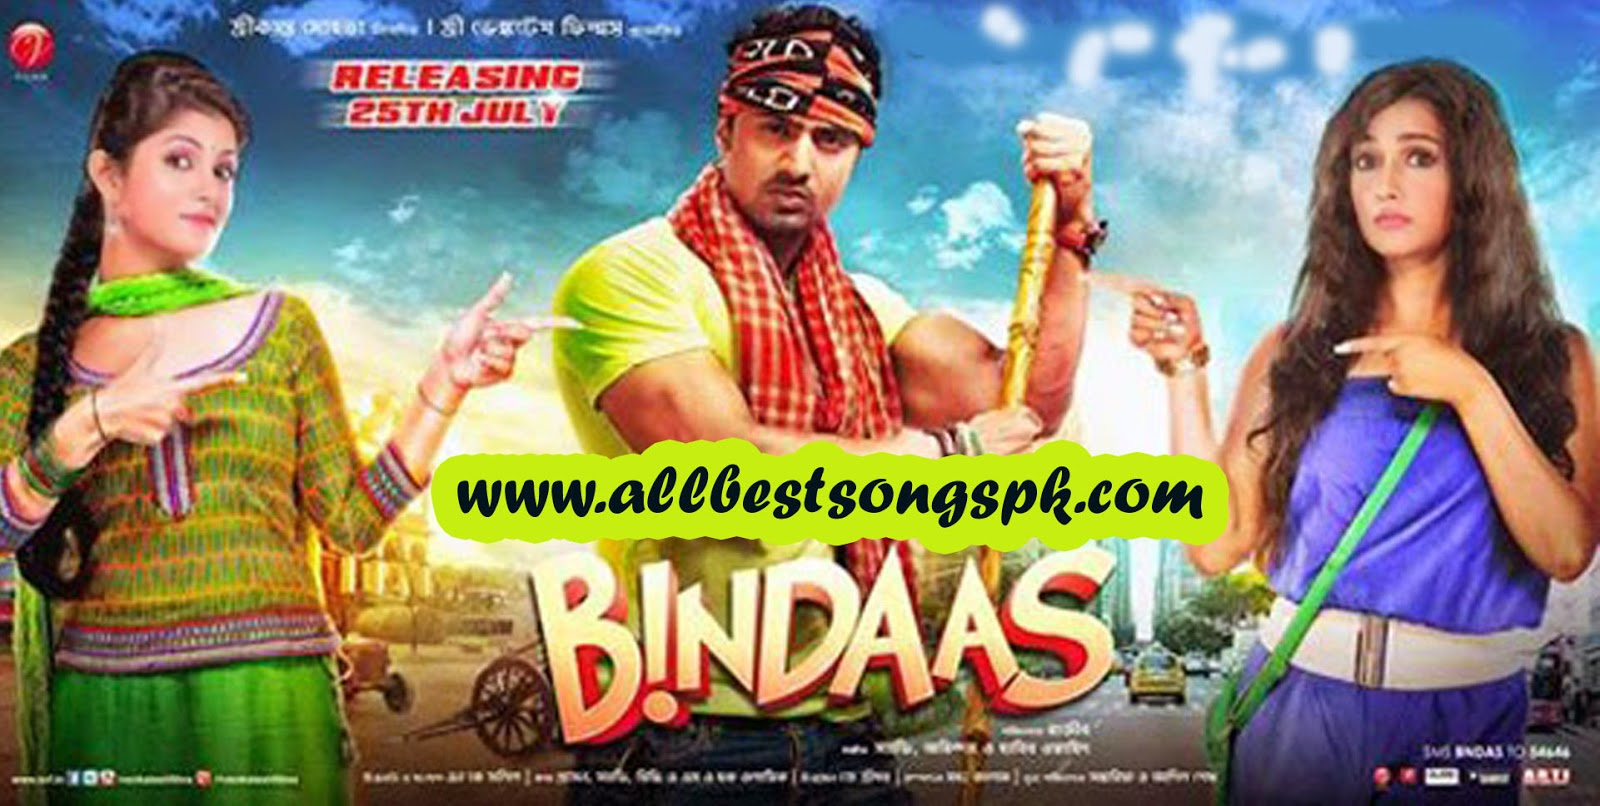 Musiqhut free download mp3 songs: bindaas telugu movie 2009 free.